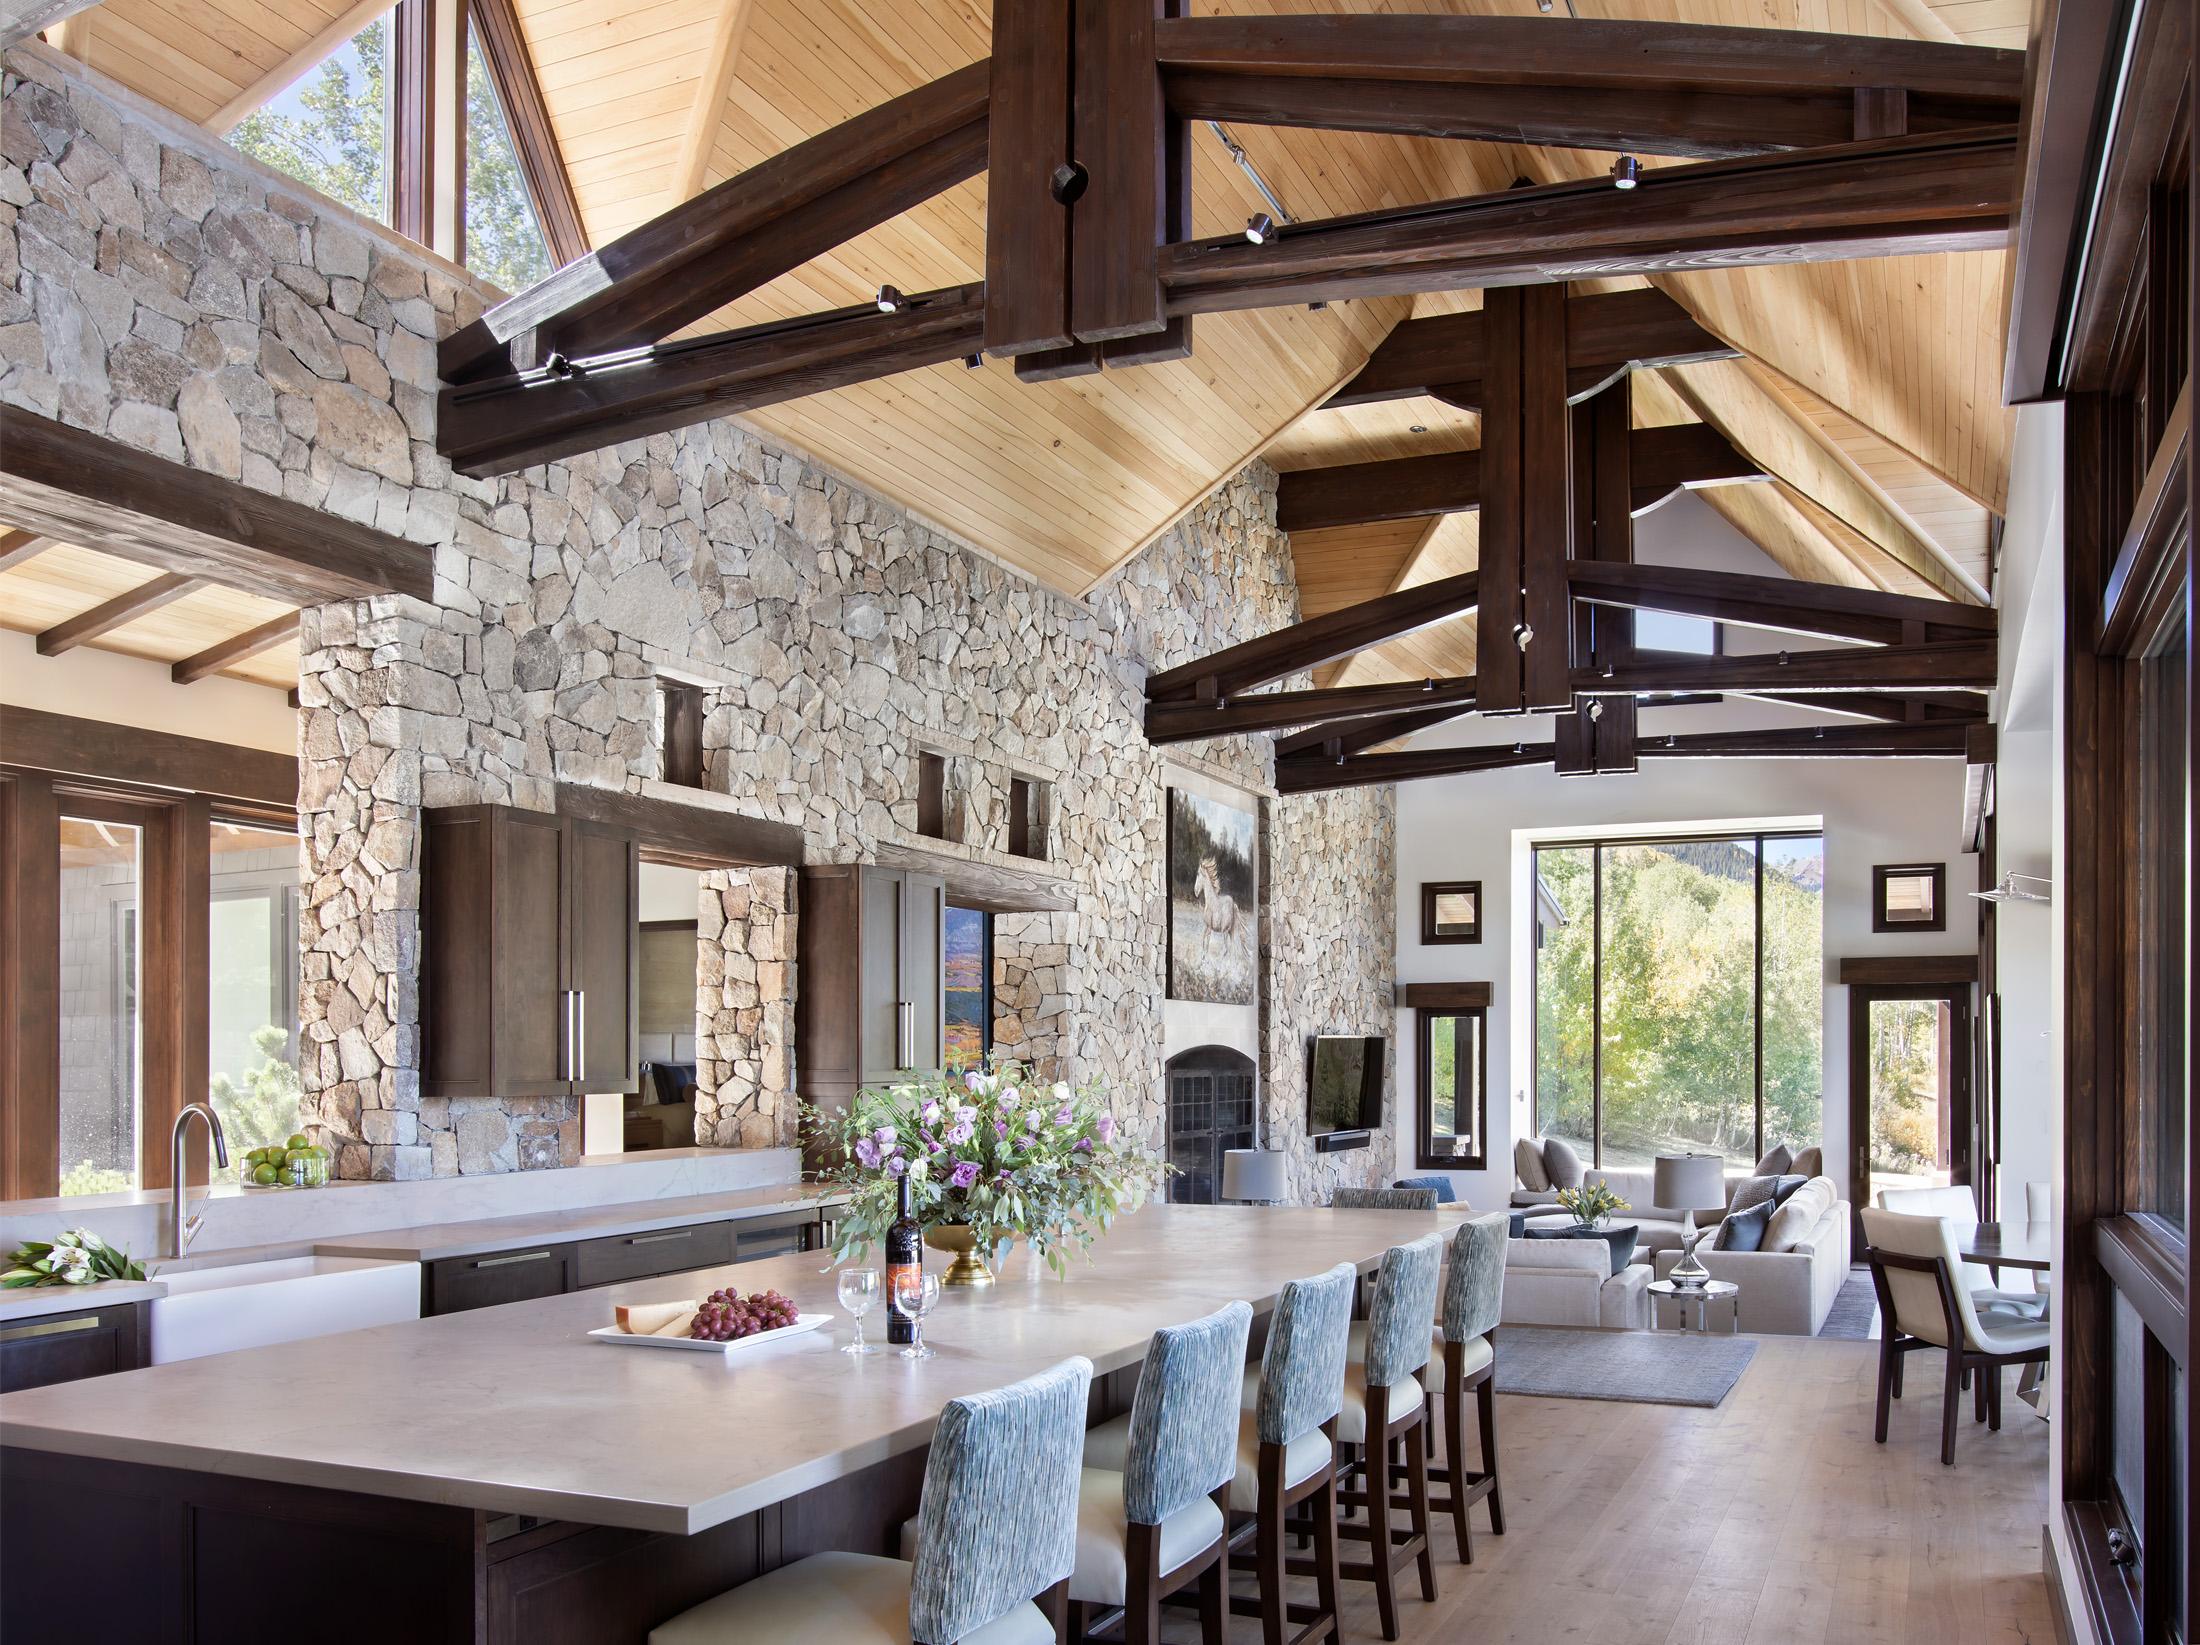 Interior Design + Custom Art: The Perfect Combination | Home decorated with custom art